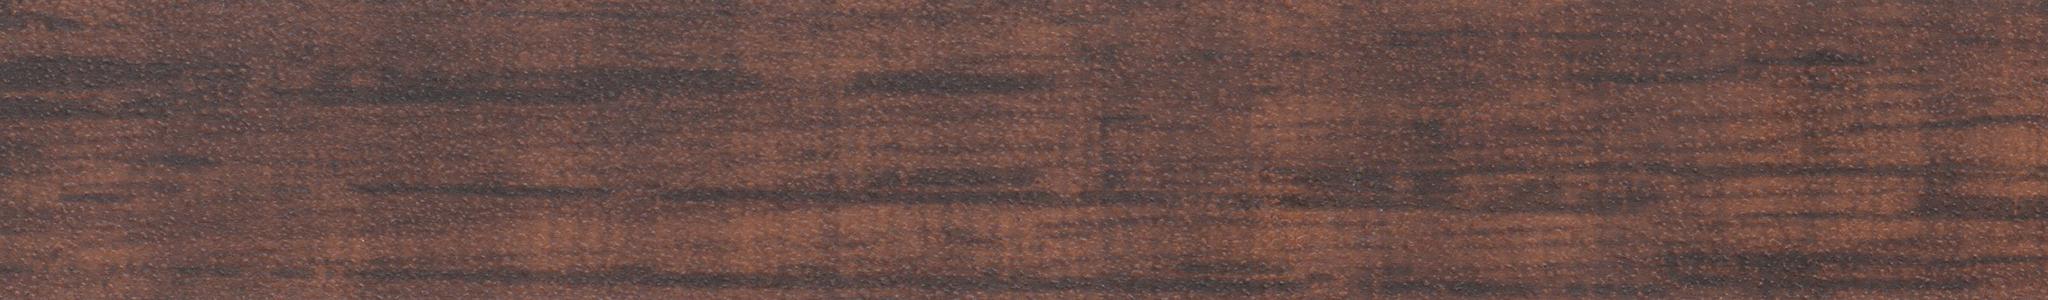 HD 291111 ABS Kante Dekor Schlangenholz perl